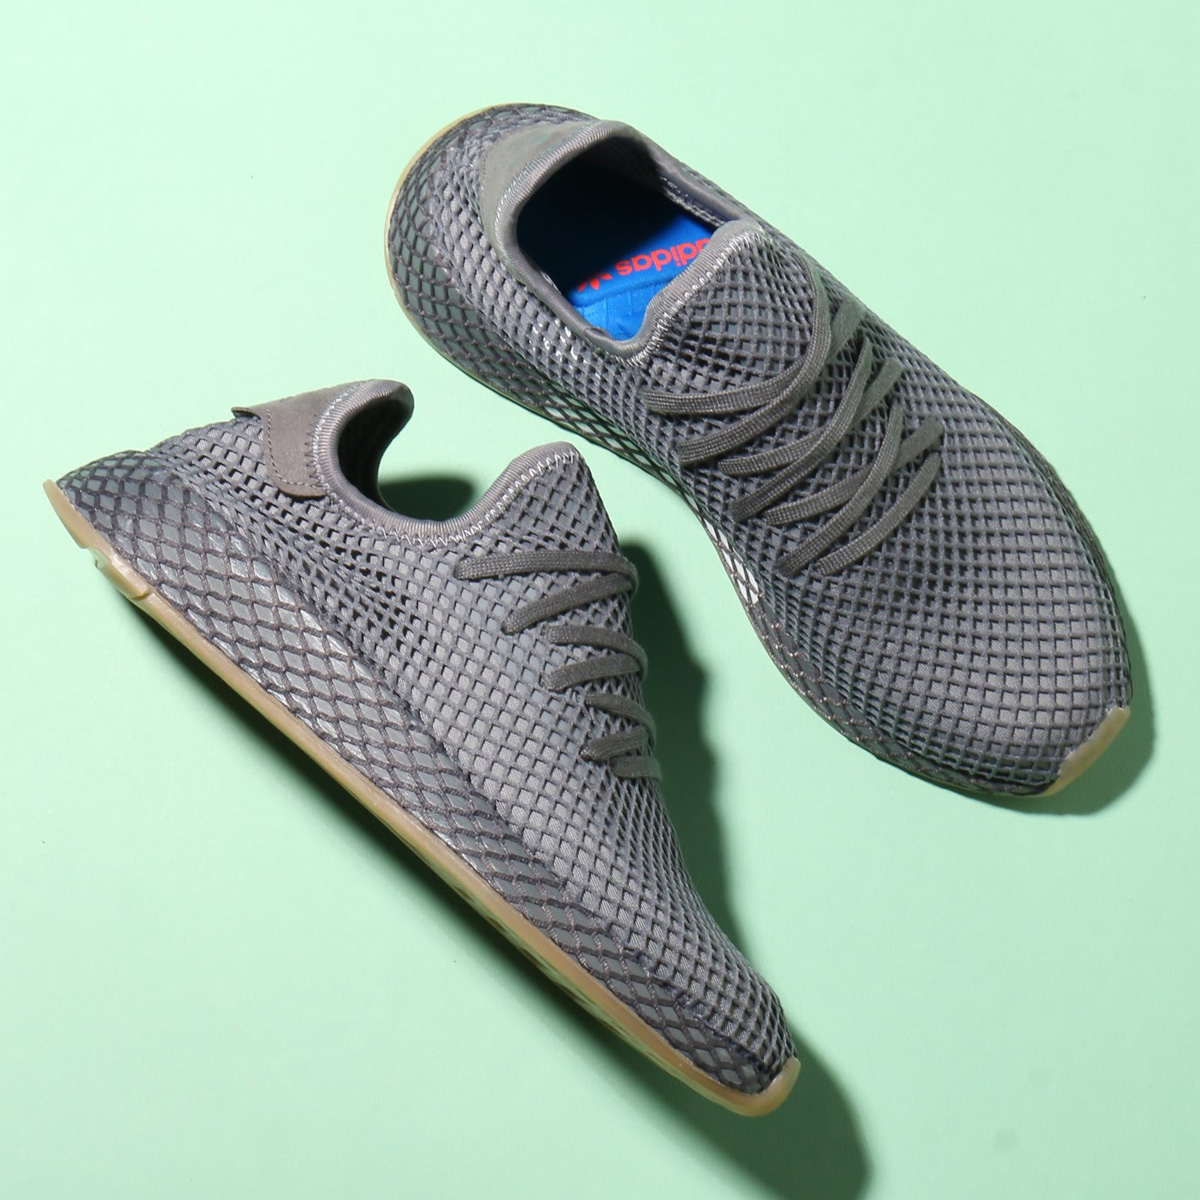 adidas Originals DEERUPT RUNNER (アディダス オリジナルス ディーラプト ランナー) Grey Three/Grey Four/Ftwr White【メンズ スニーカー】18SS-S